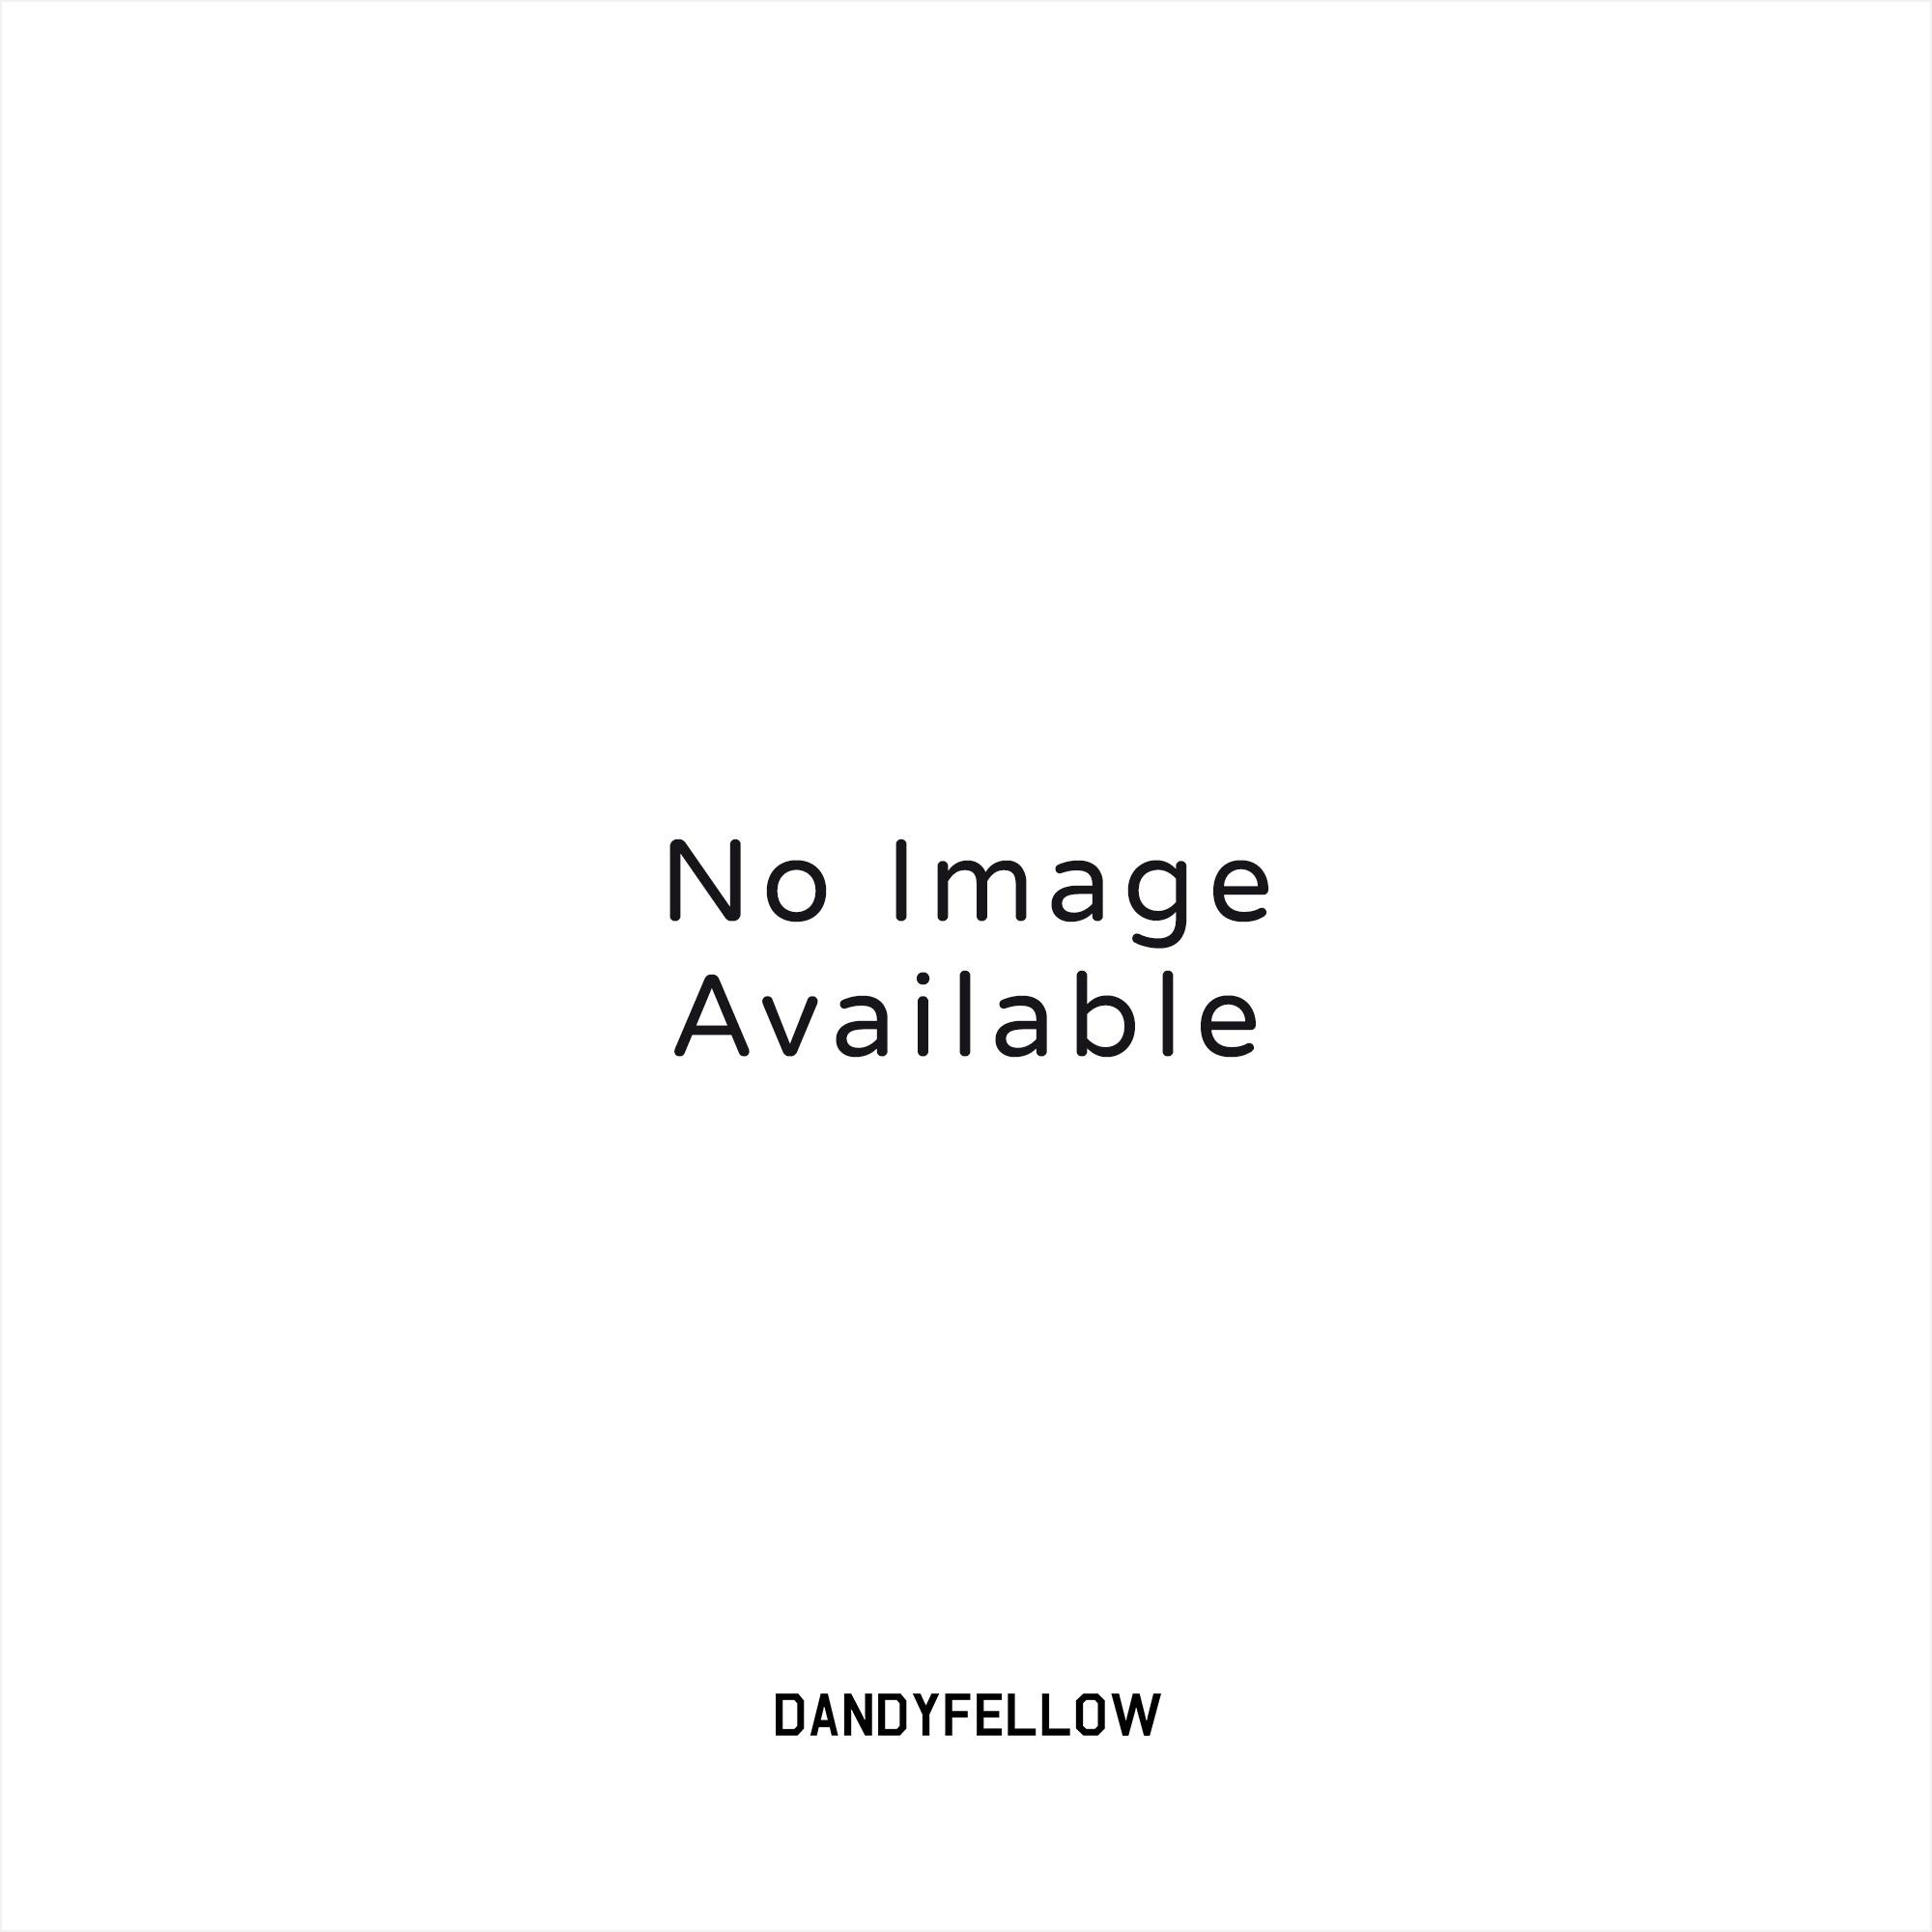 dd3f16ad5d Ellesse Optic White Motti Polo Shirt SHW04468 | Dandy Fellow